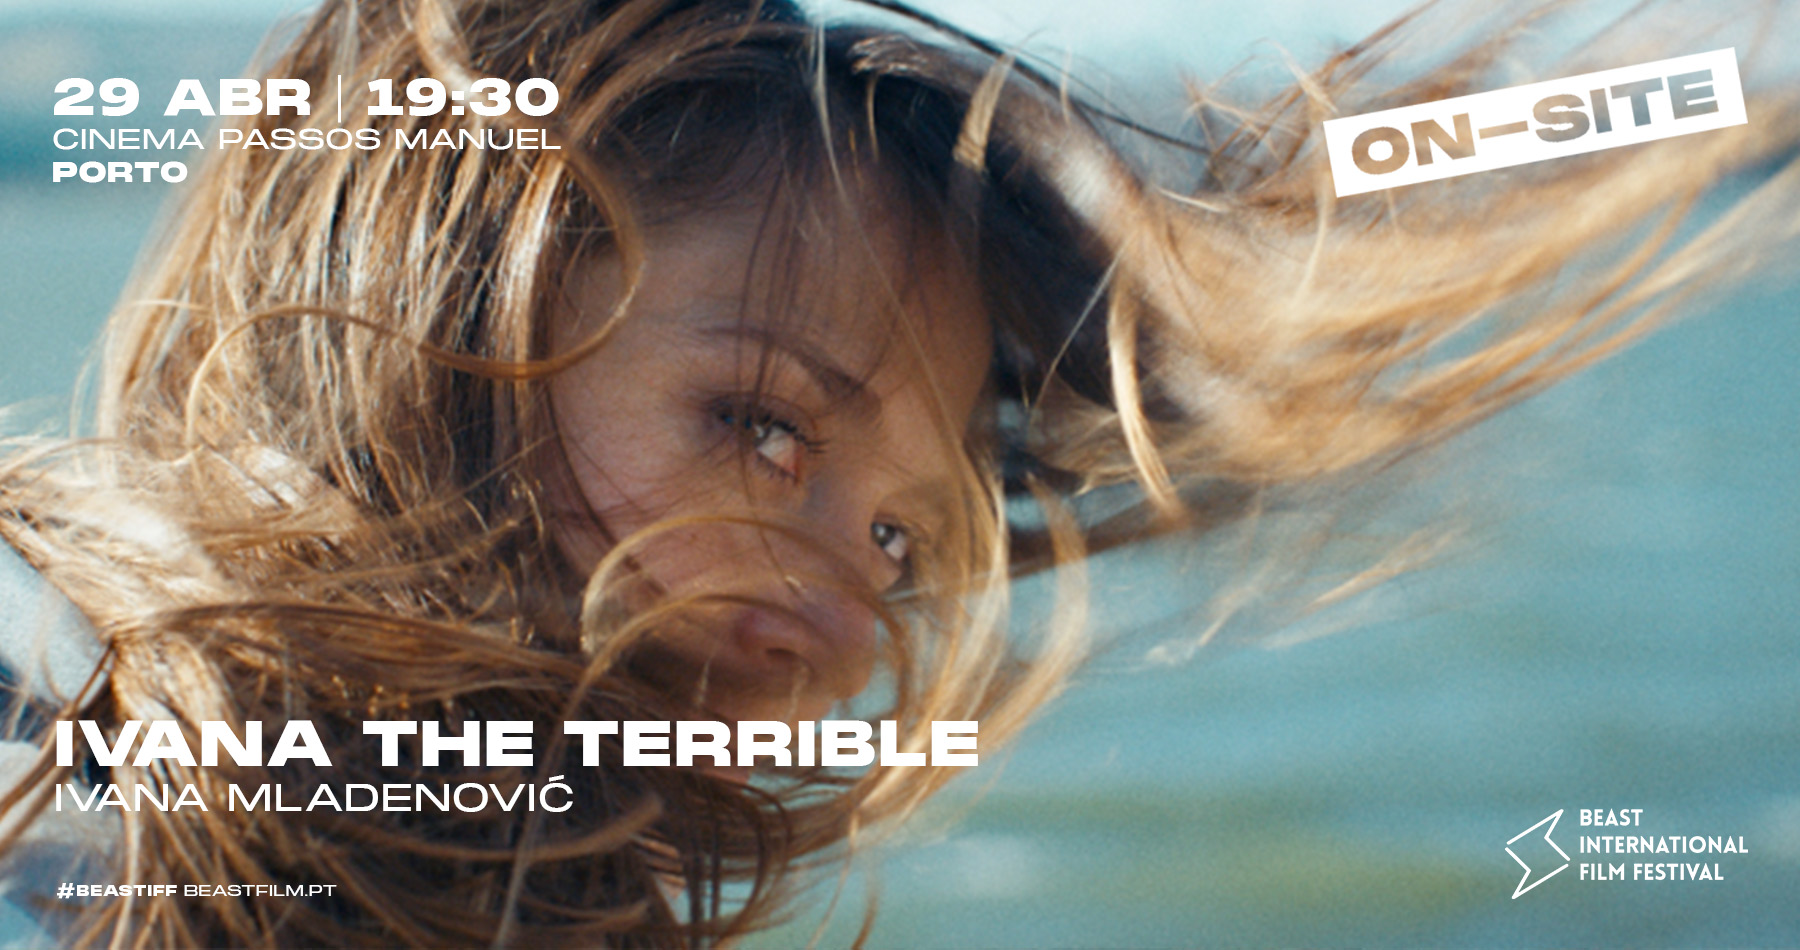 BEAST IFF ON-SITE #1 | Ivana The Terrible